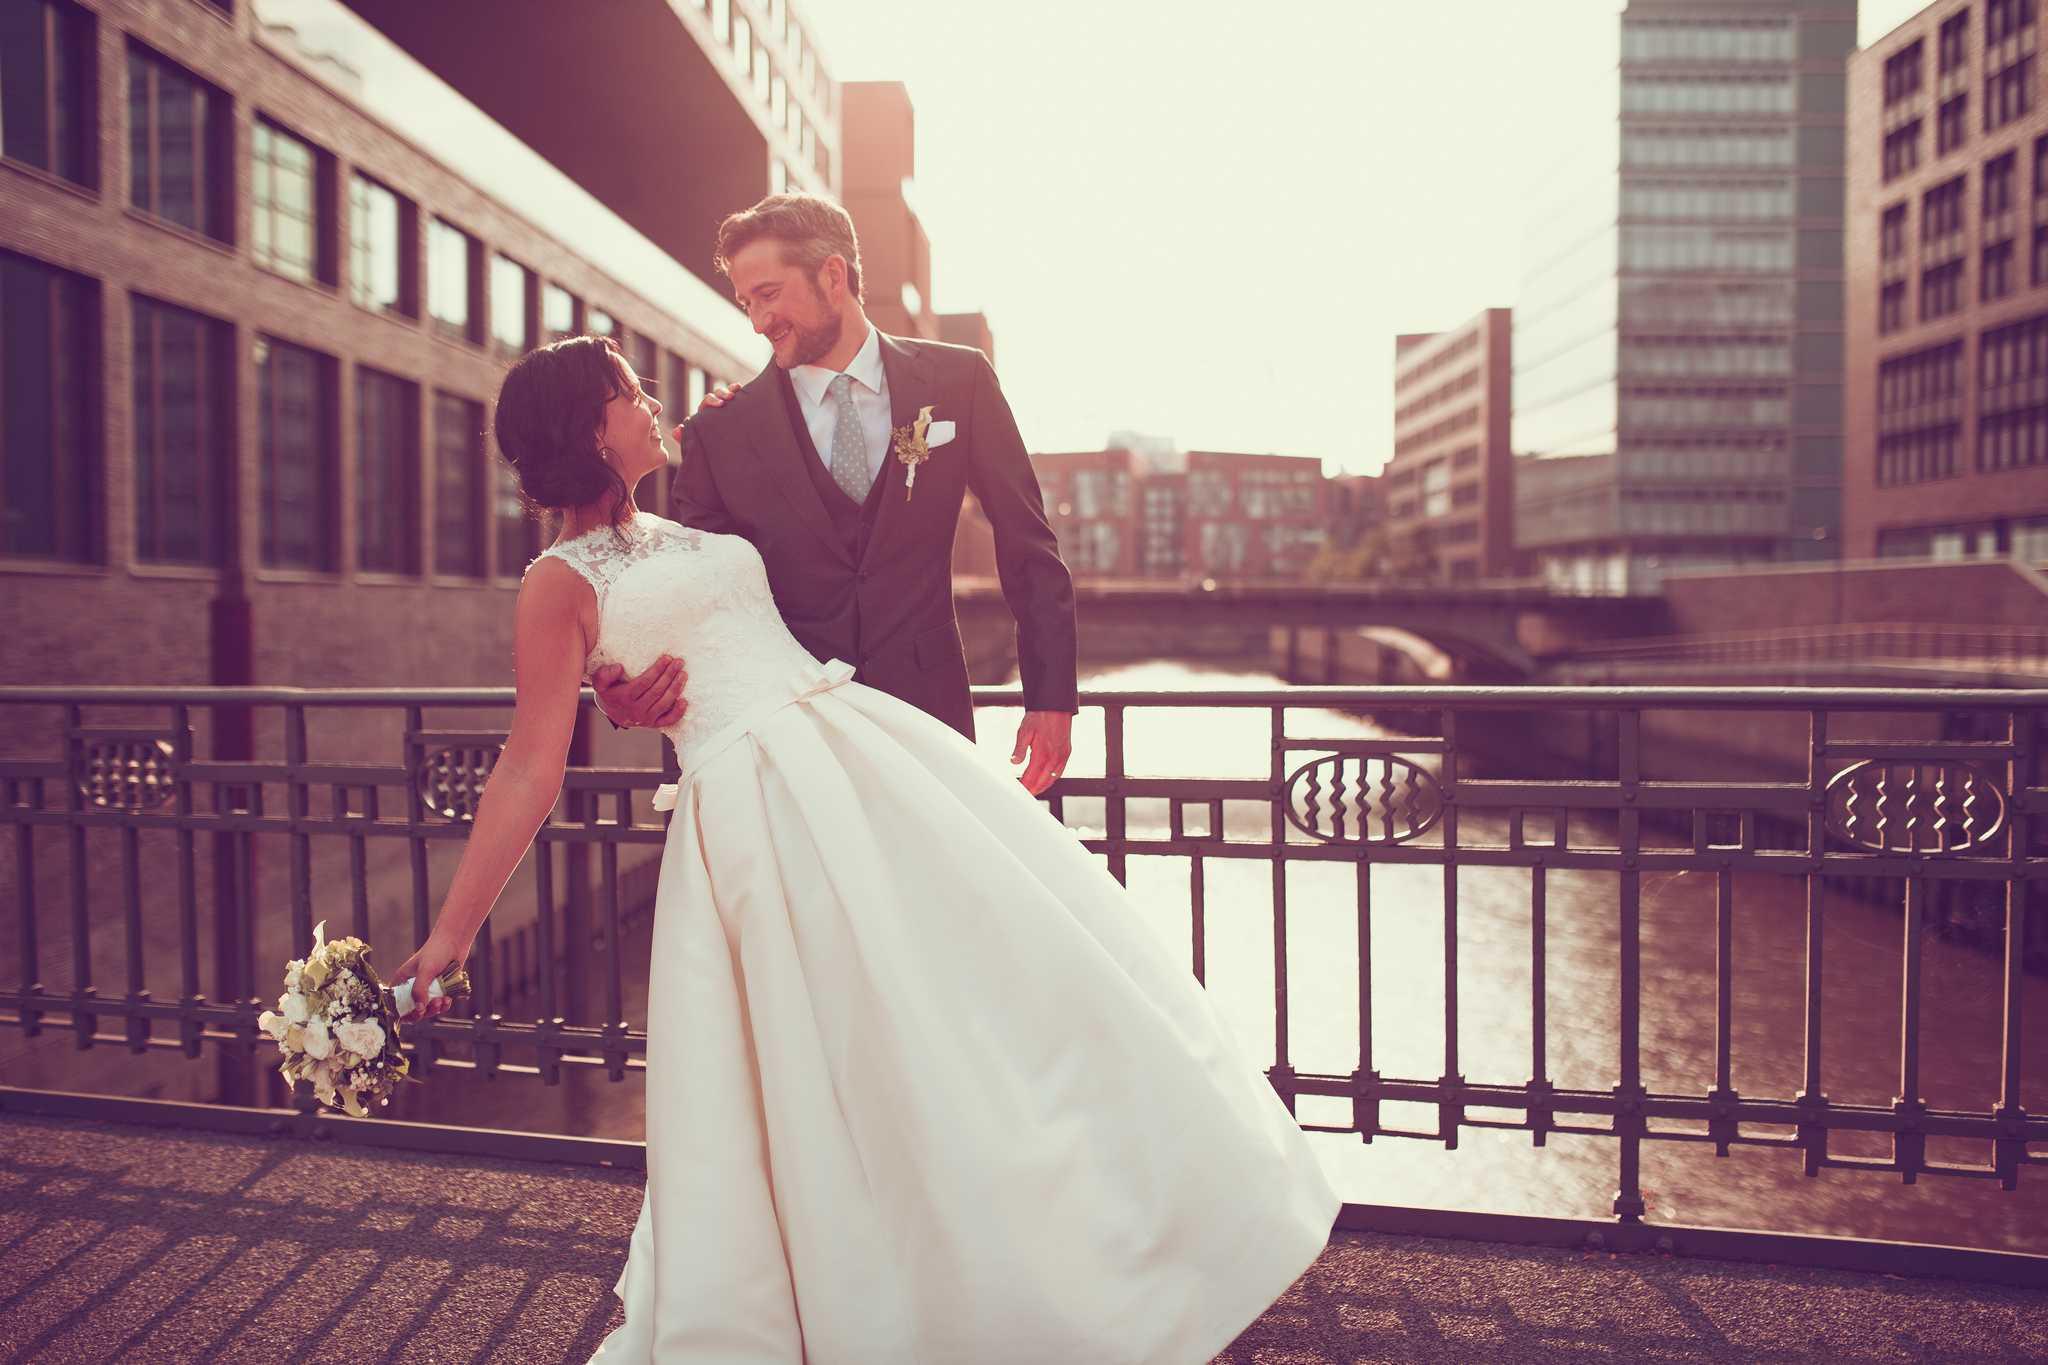 wedding-kaphi12.jpg